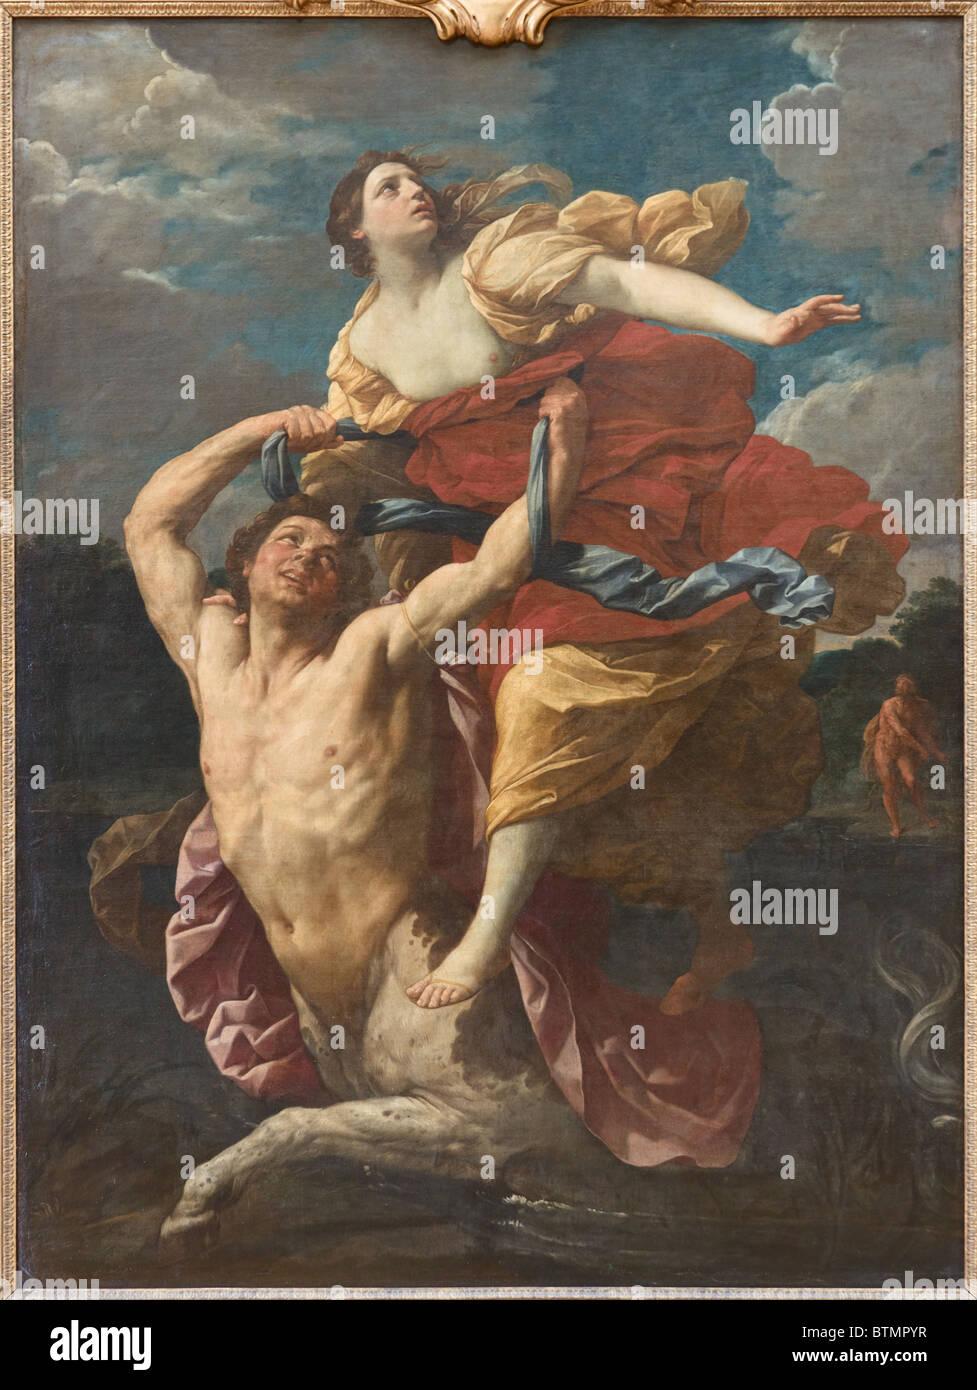 Abduction of Deianira by Centaur Nessus (Nessos), by Italian painter Guido RENI, c. 1620-21, Louvre Museum Paris - Stock Image